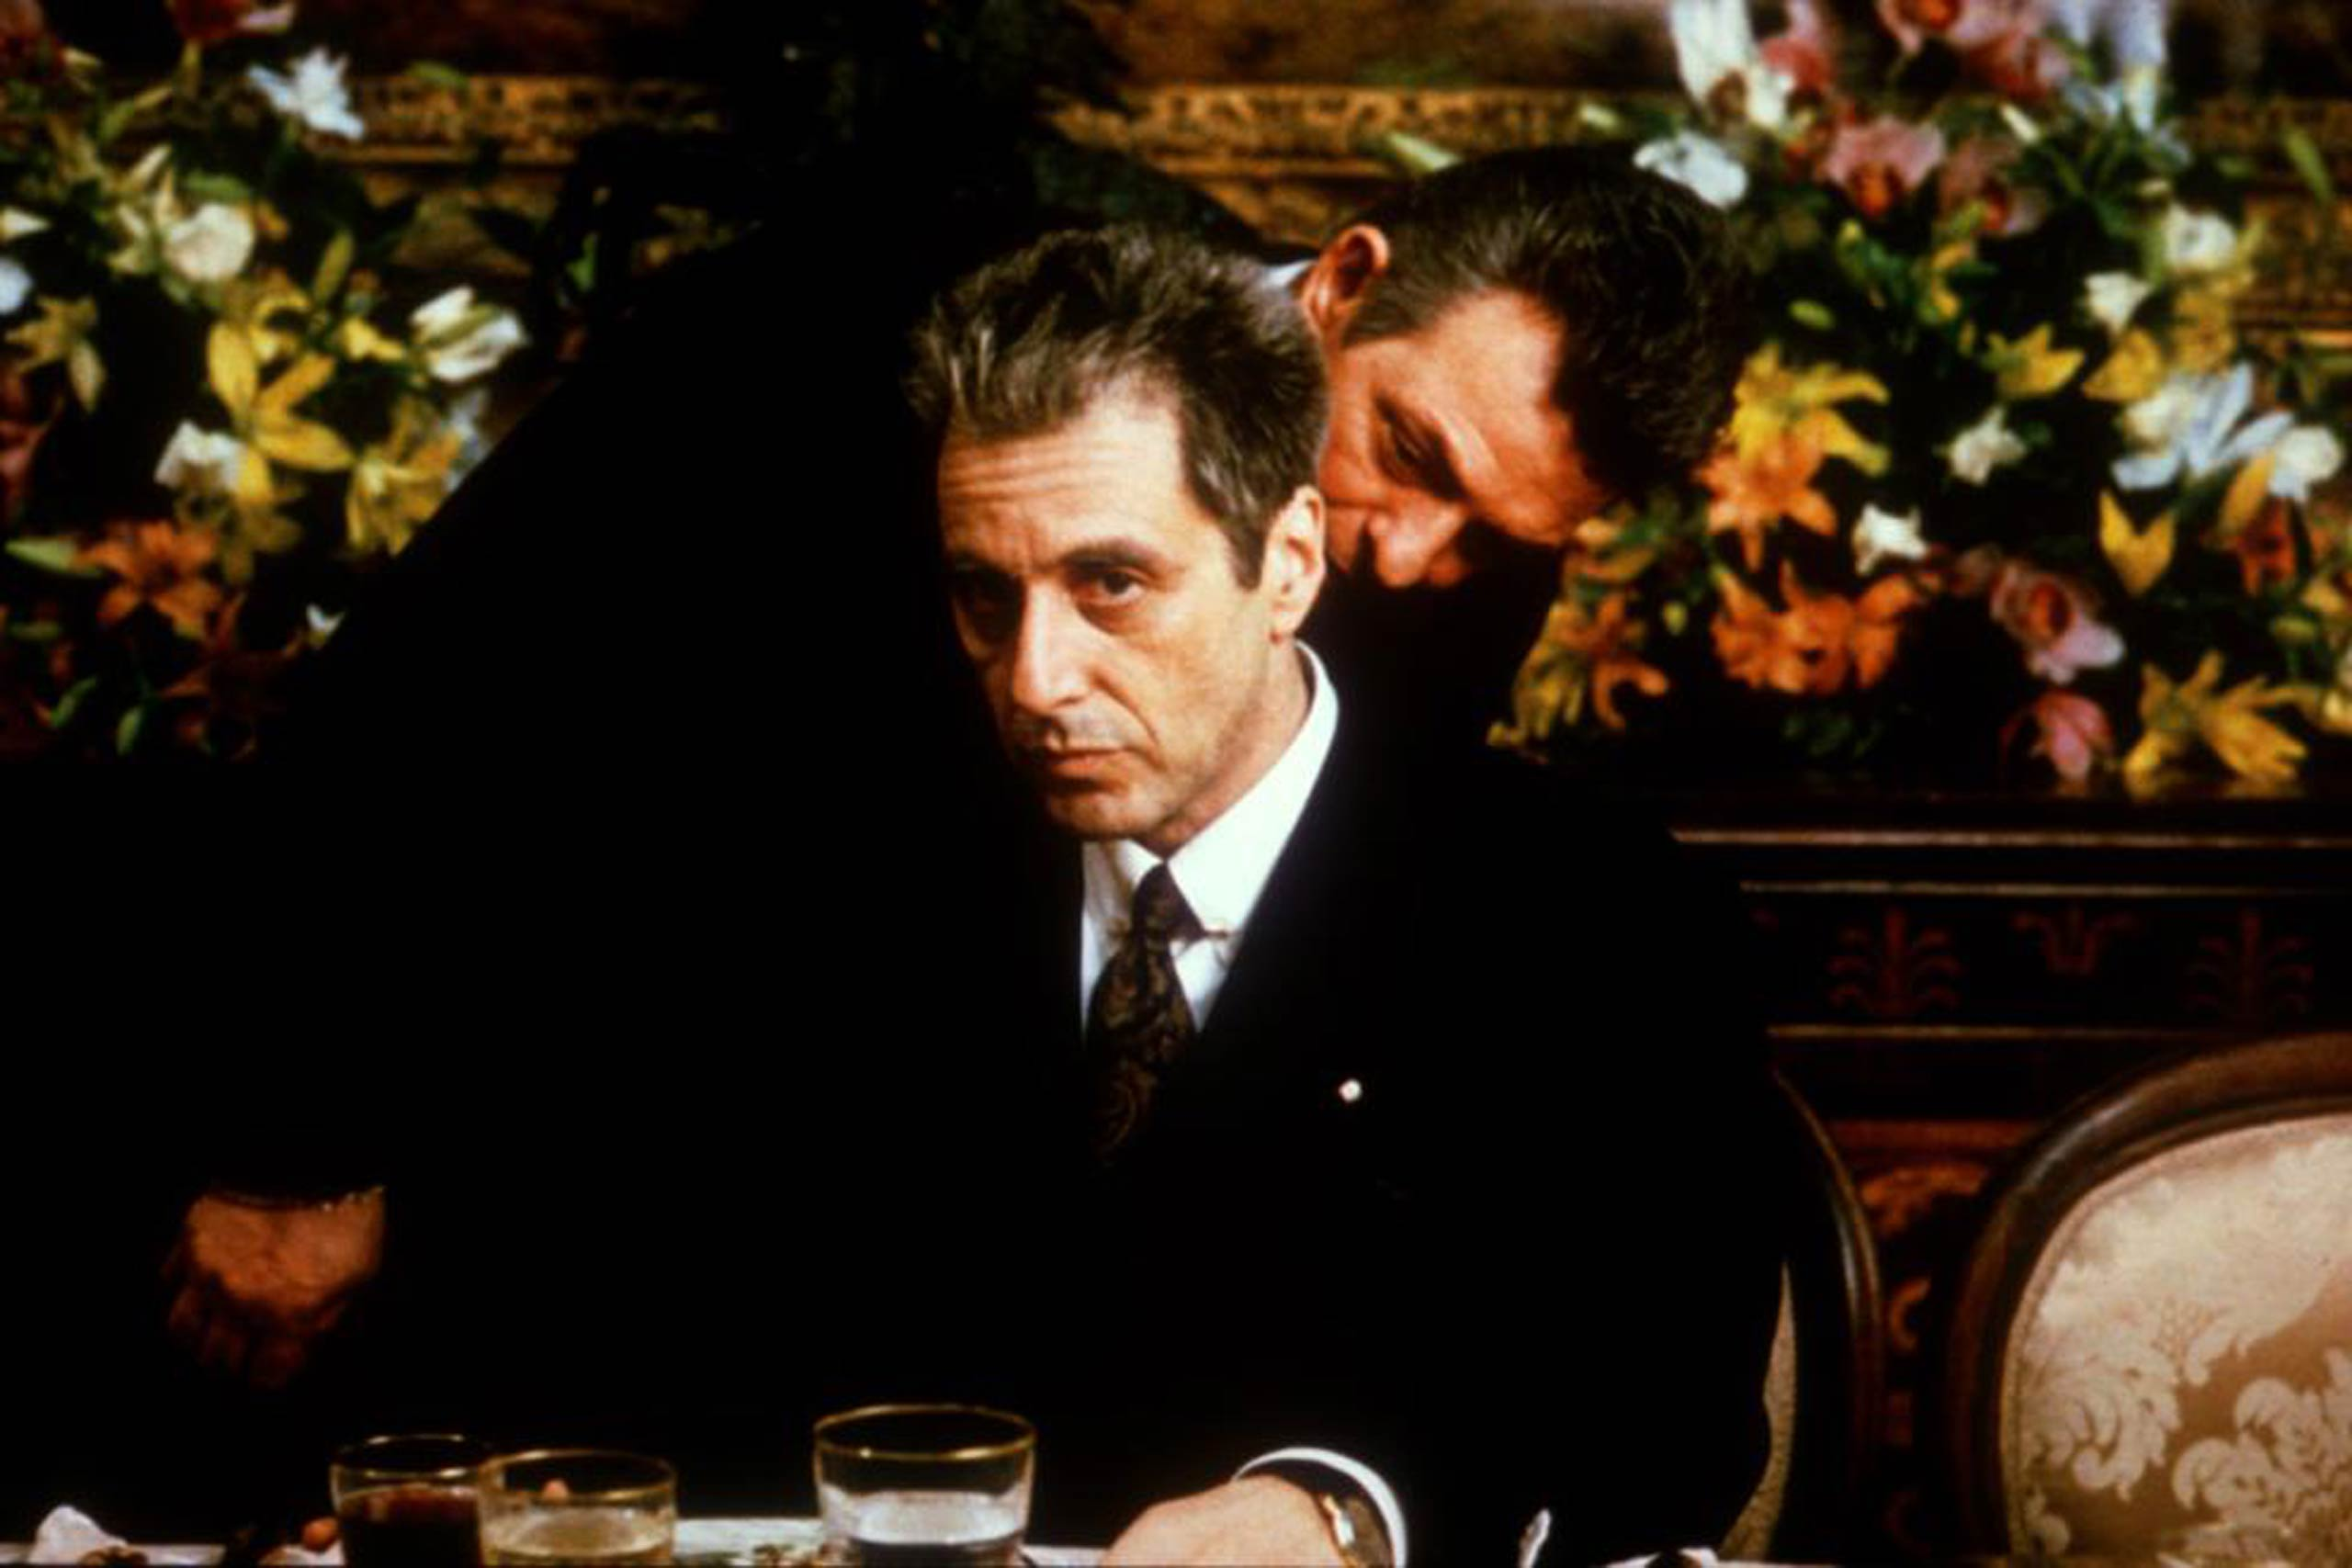 Michael Corleone - The Godfather Part III, 1990